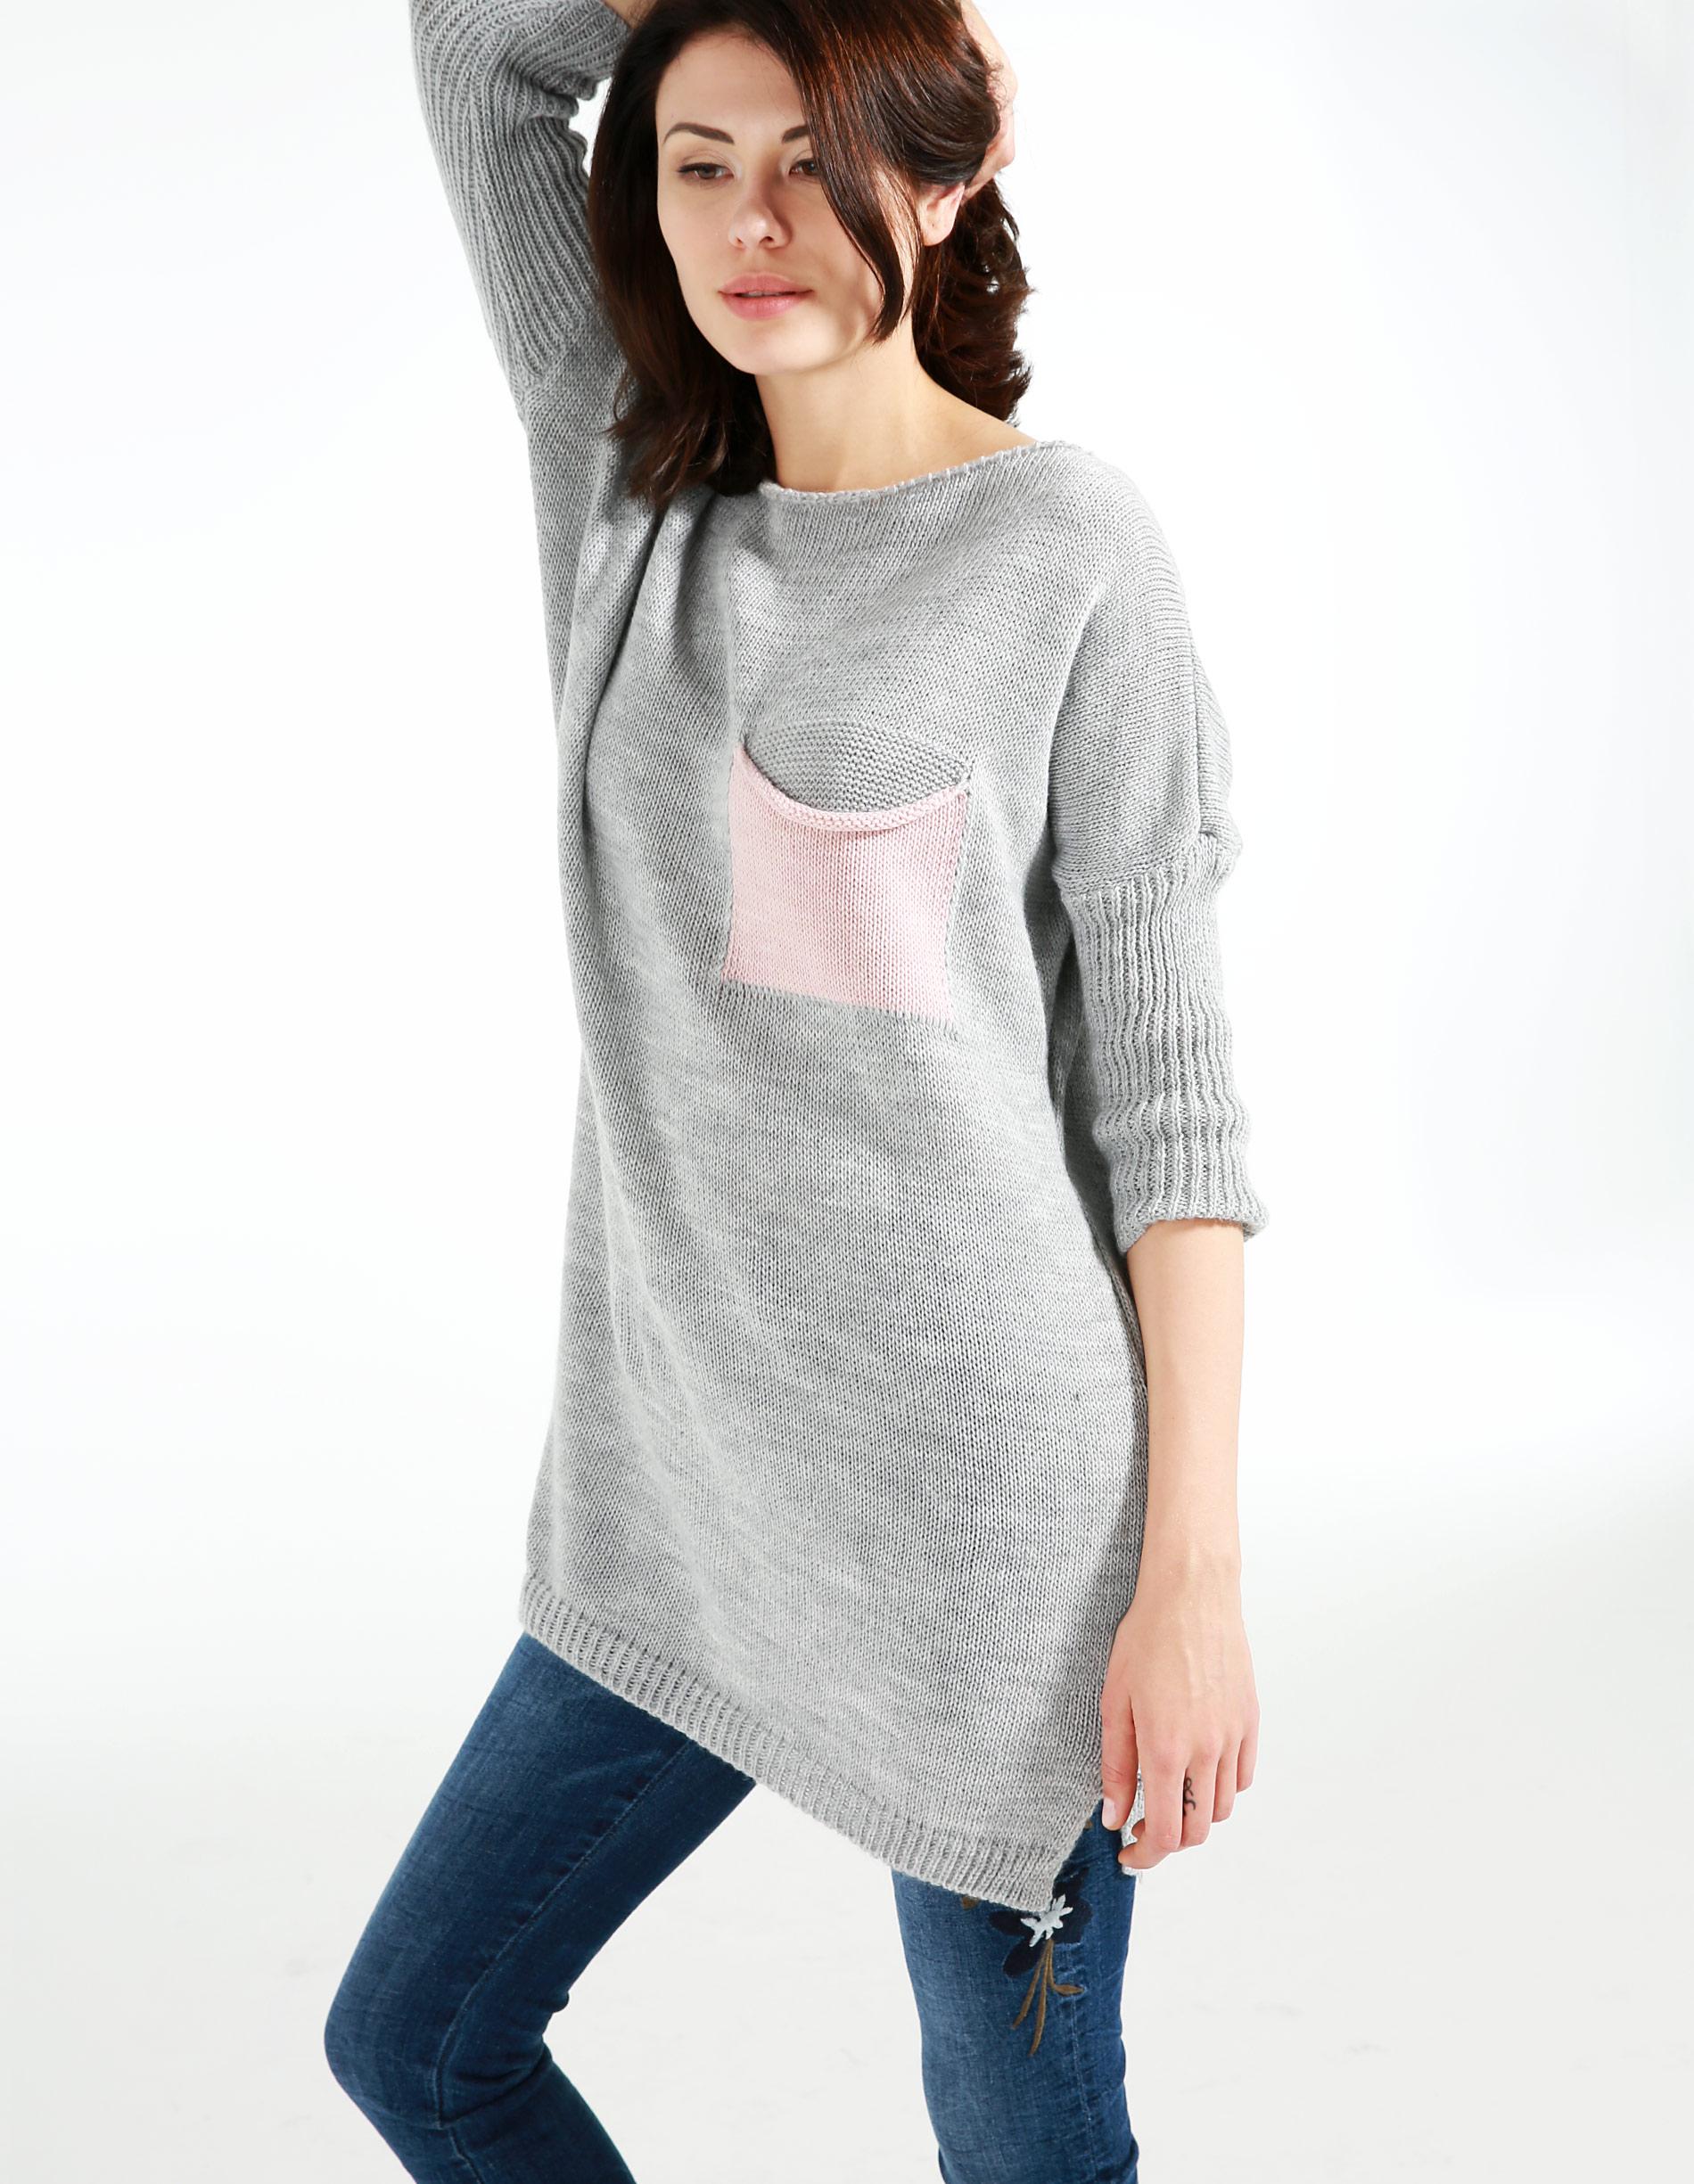 Sweter - 8-828 GRI CHI - Unisono